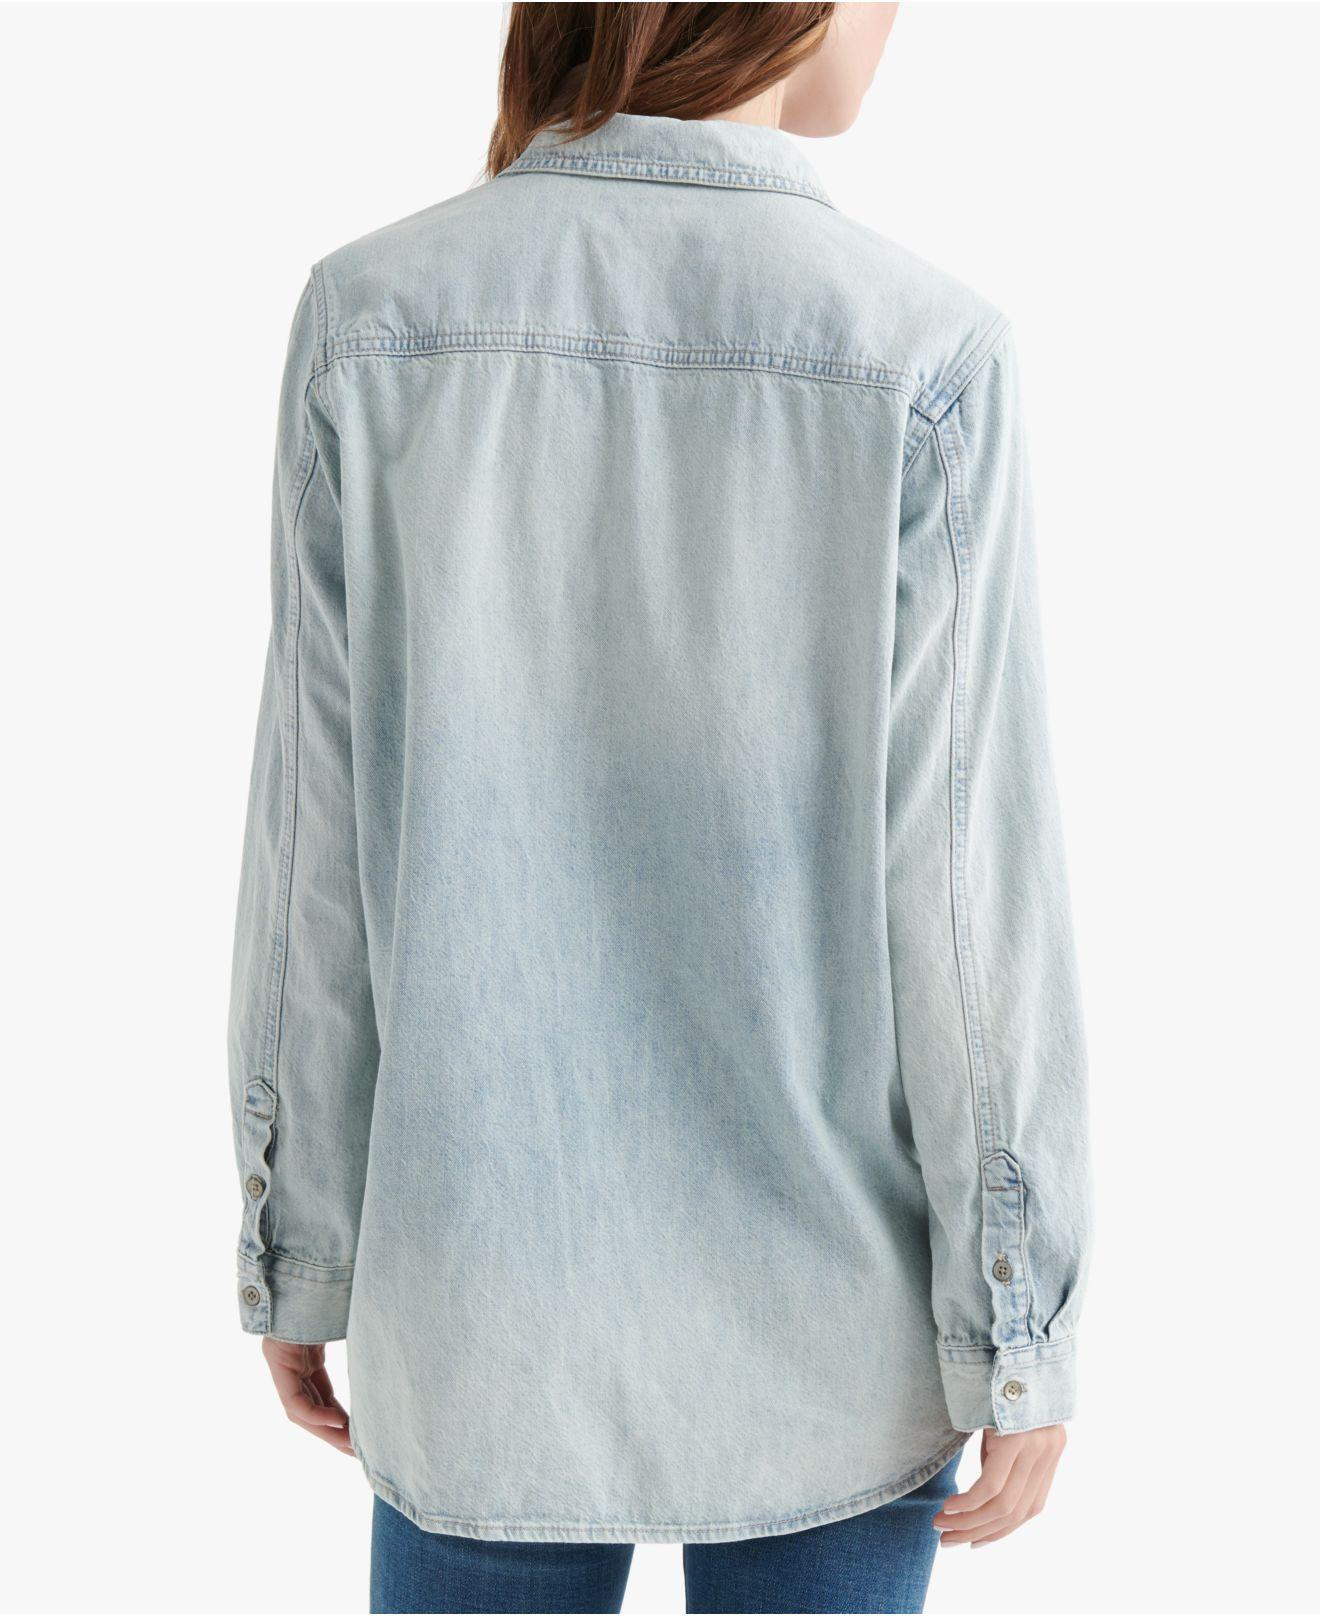 4dac5798a5771 Lyst - Lucky Brand Cotton Embroidered Boyfriend Shirt in Blue